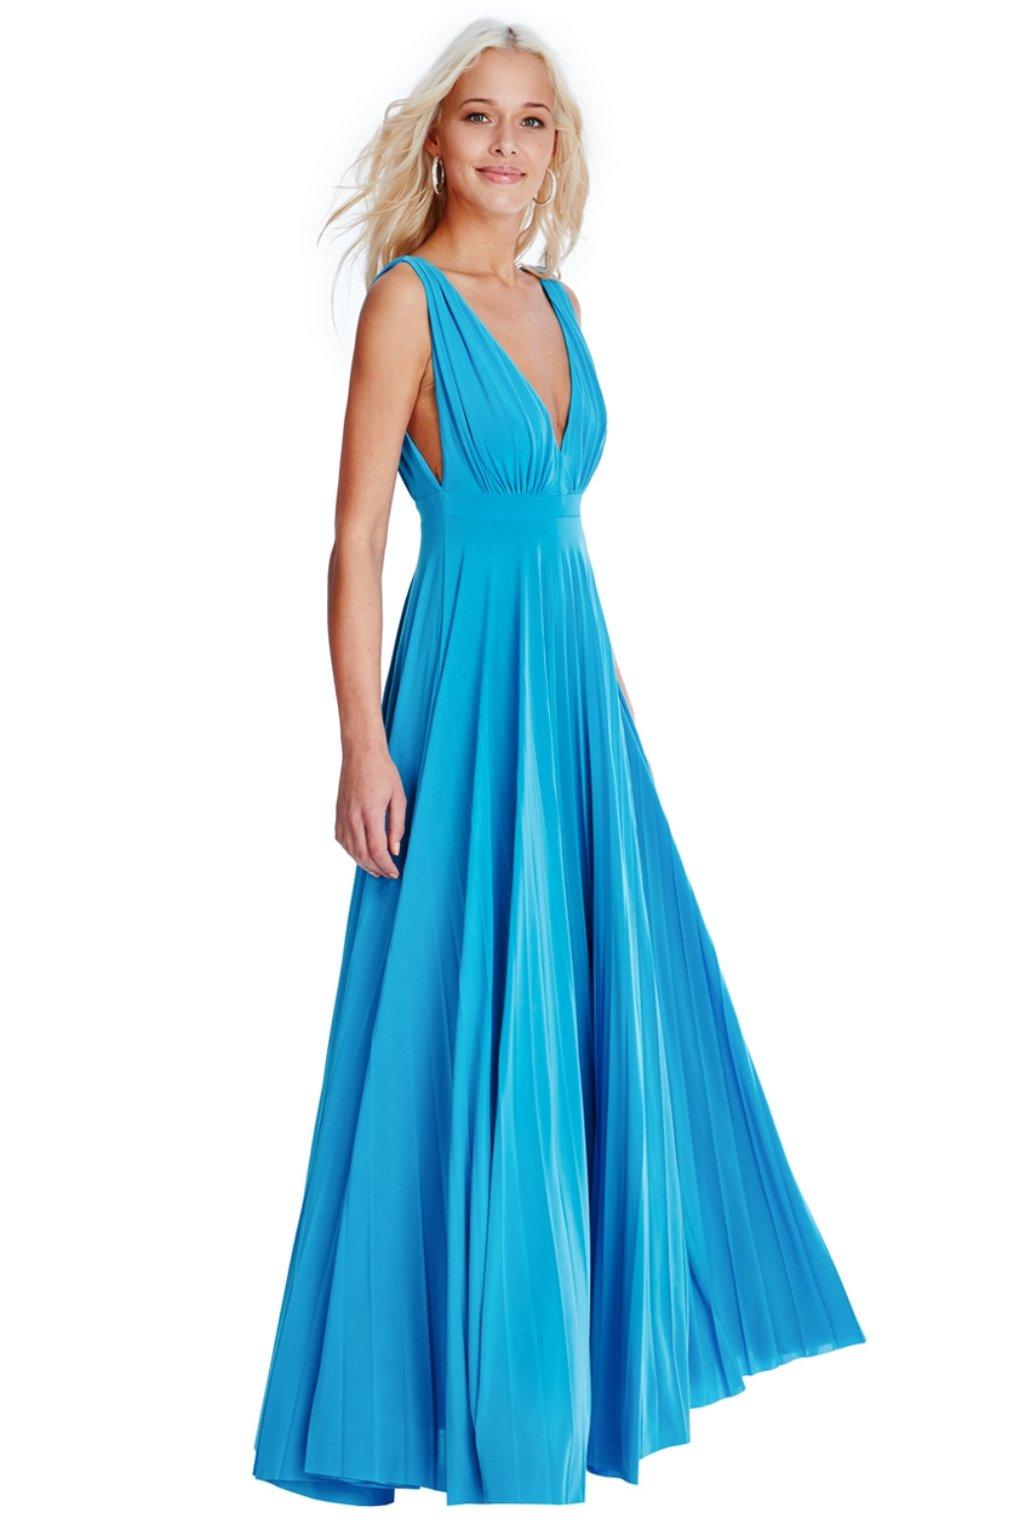 Tyrkysové spoločenské šaty s plisovanou sukňou